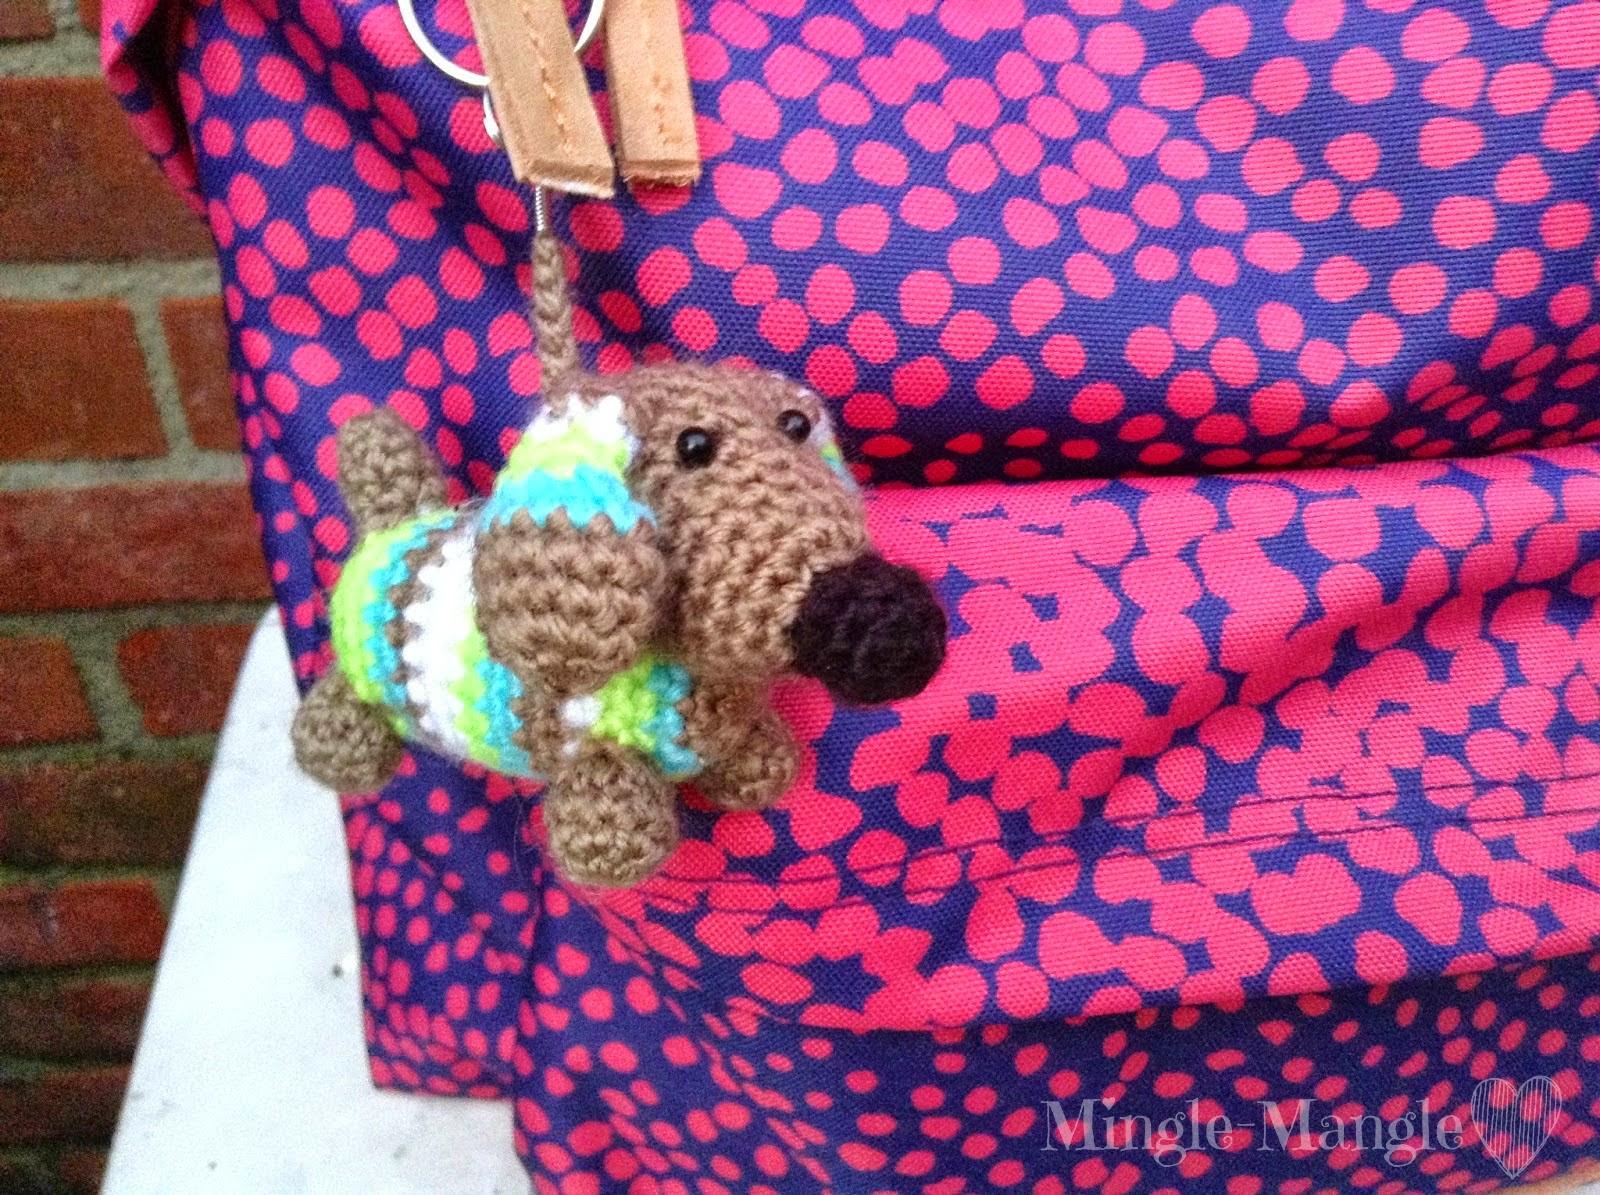 Mingle Mangle Crochet Back To School Sleutelhangers